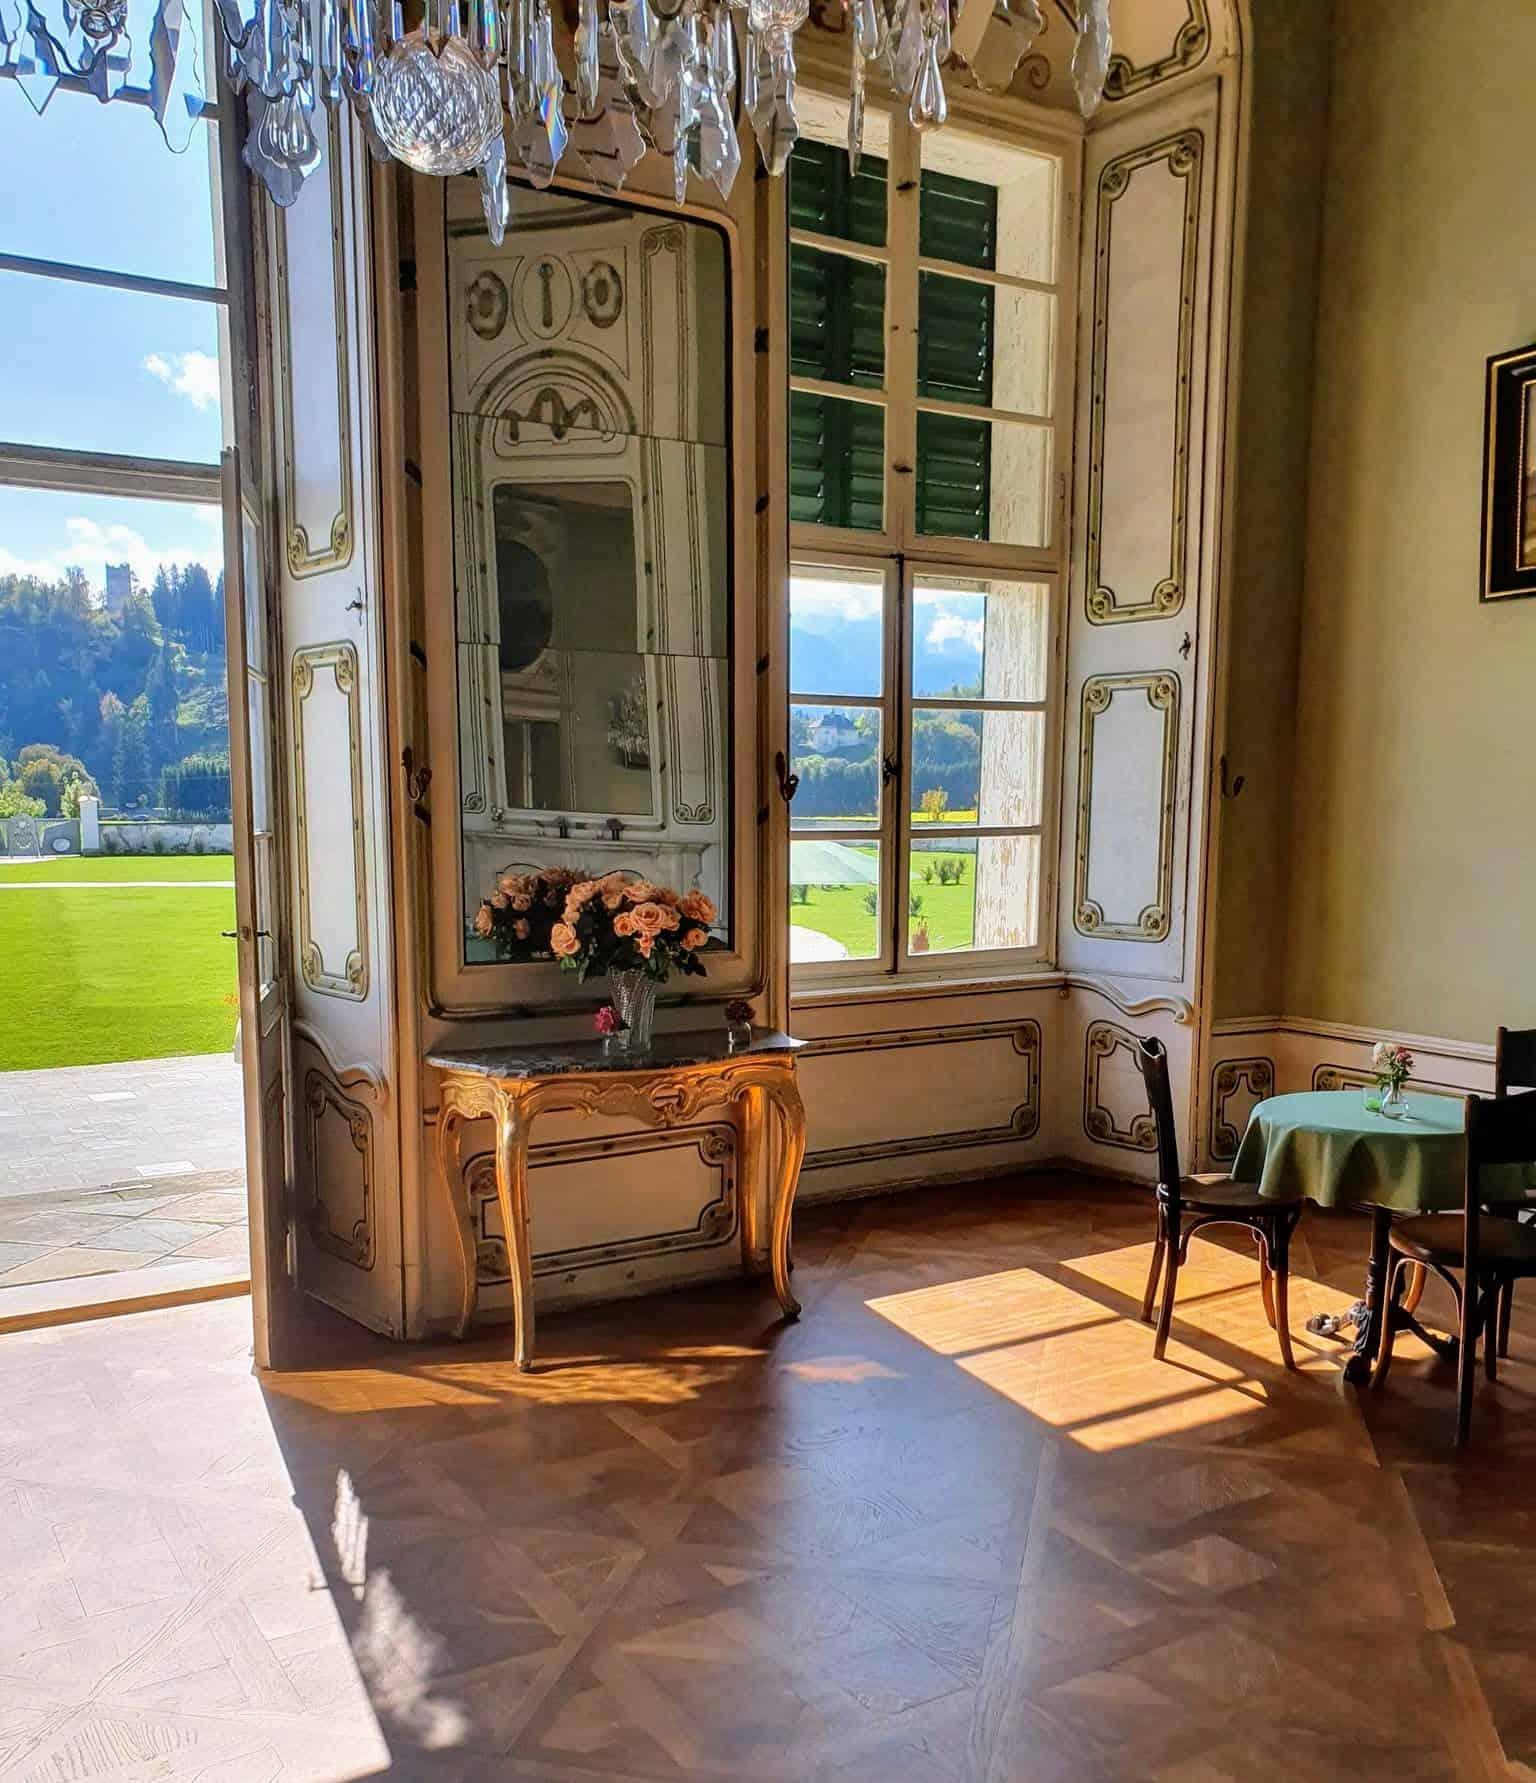 Im Schloss Rosegg - Sehenswürdigkeit in Kärnten, Nähe Velden am Wörthersee. Geheimtipp Schlosscafè